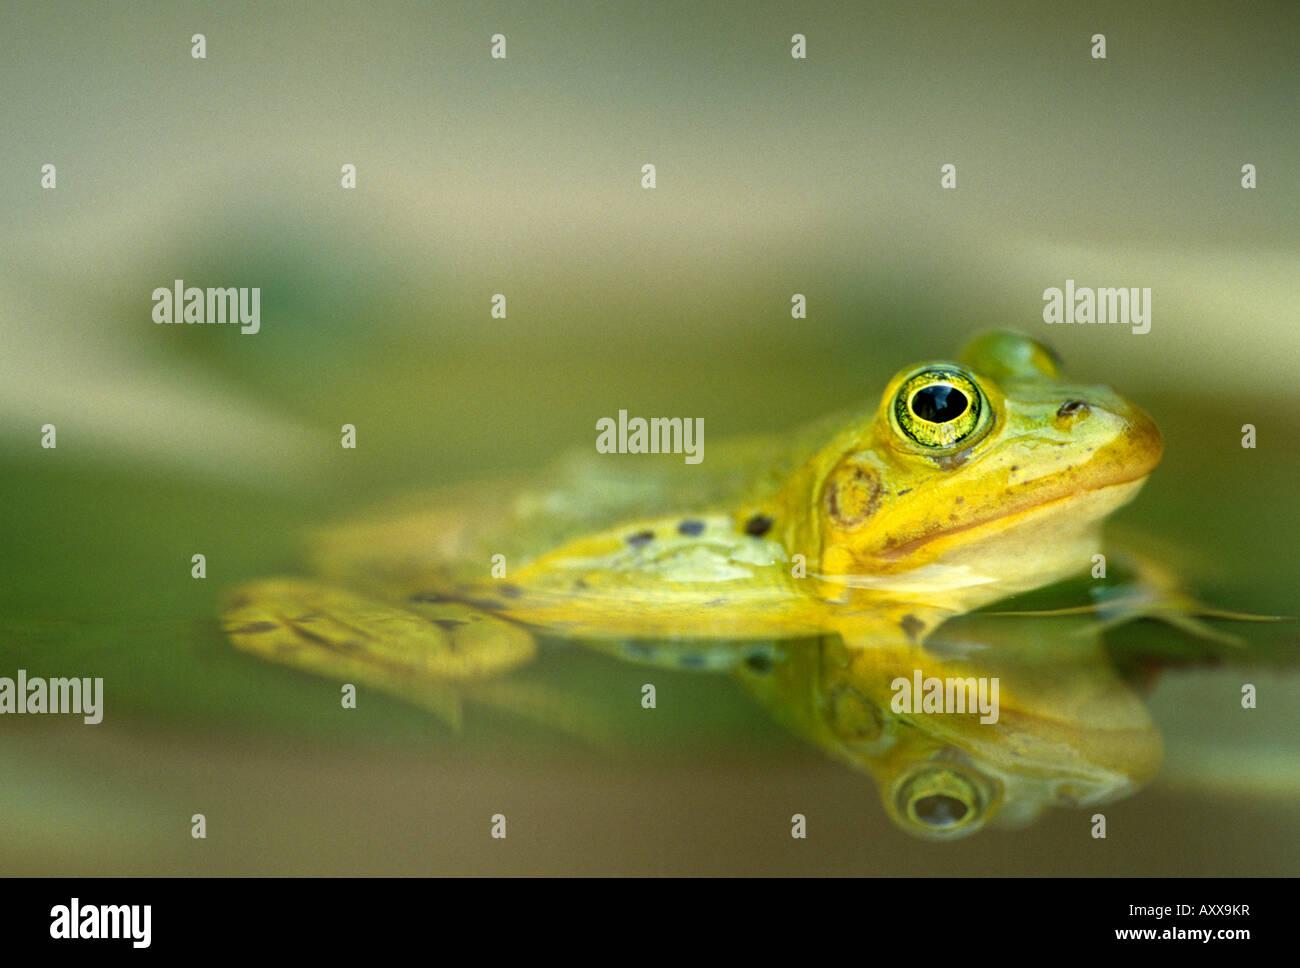 European Edible Frog, Rana esculenta, Bielefeld, NRW, Germany - Stock Image